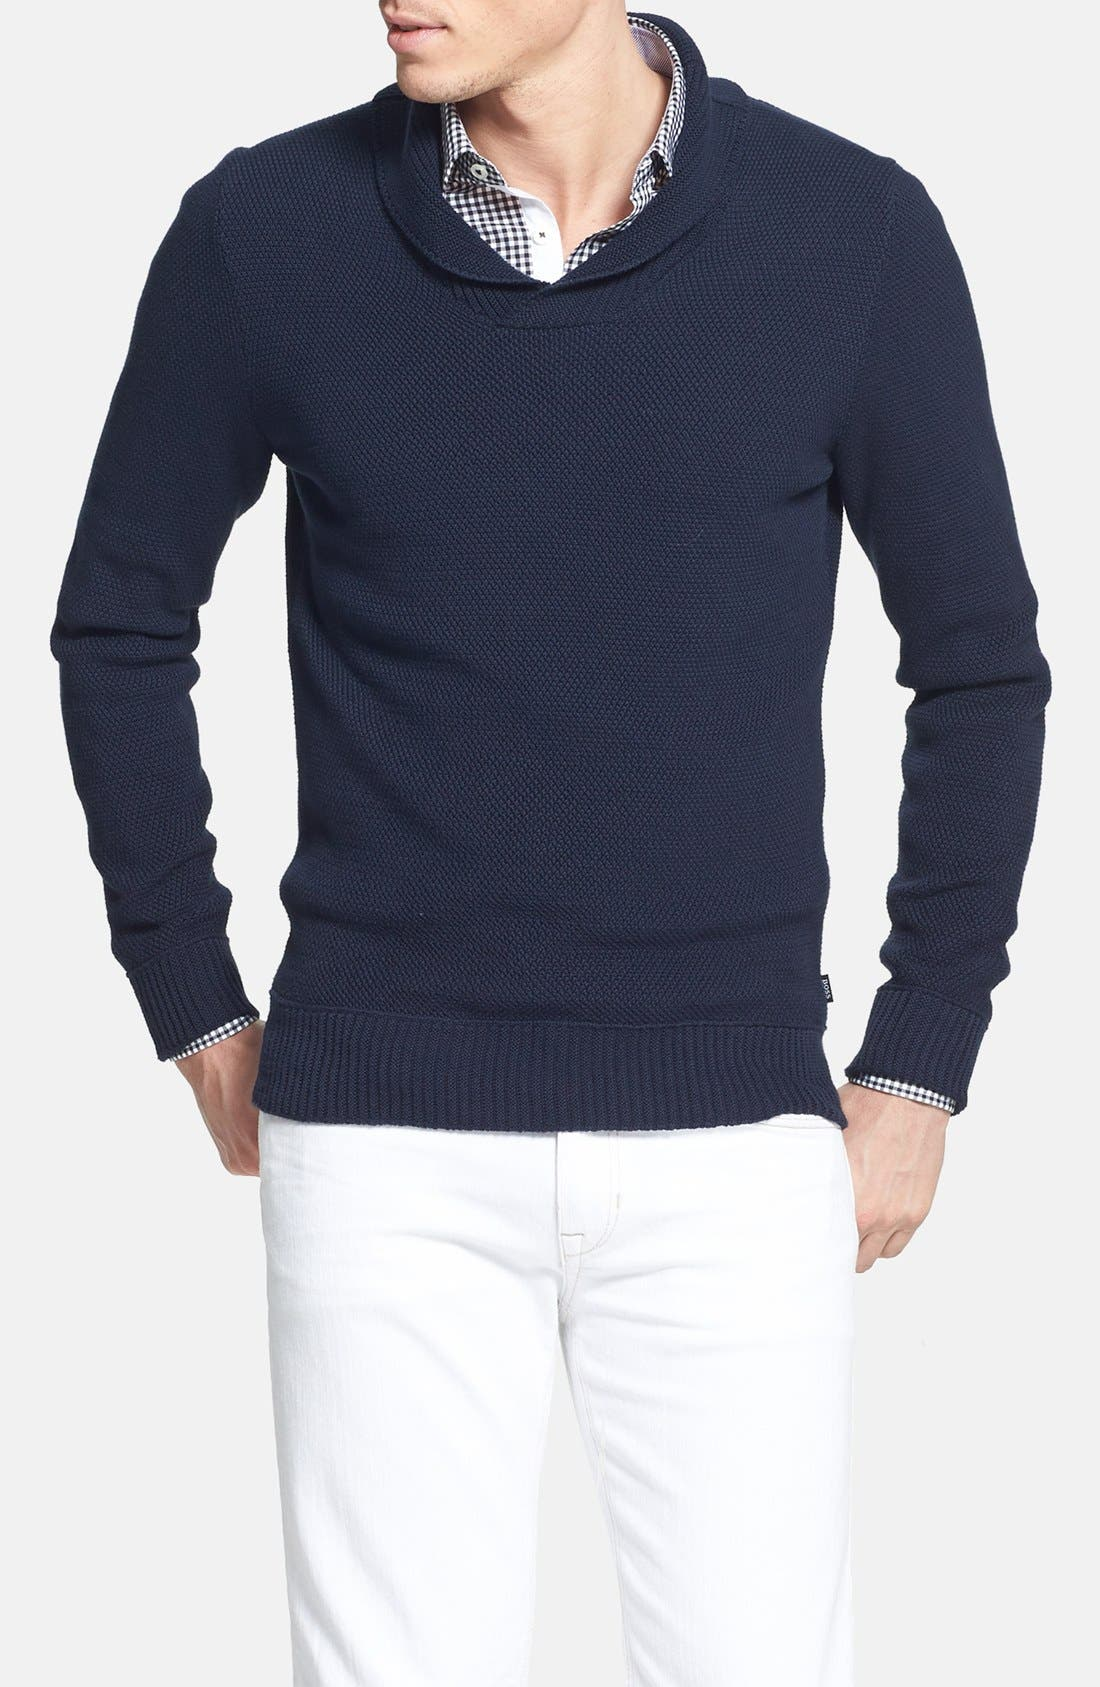 Main Image - BOSS HUGO BOSS 'Pivot' Slim Fit Shawl Collar Sweater